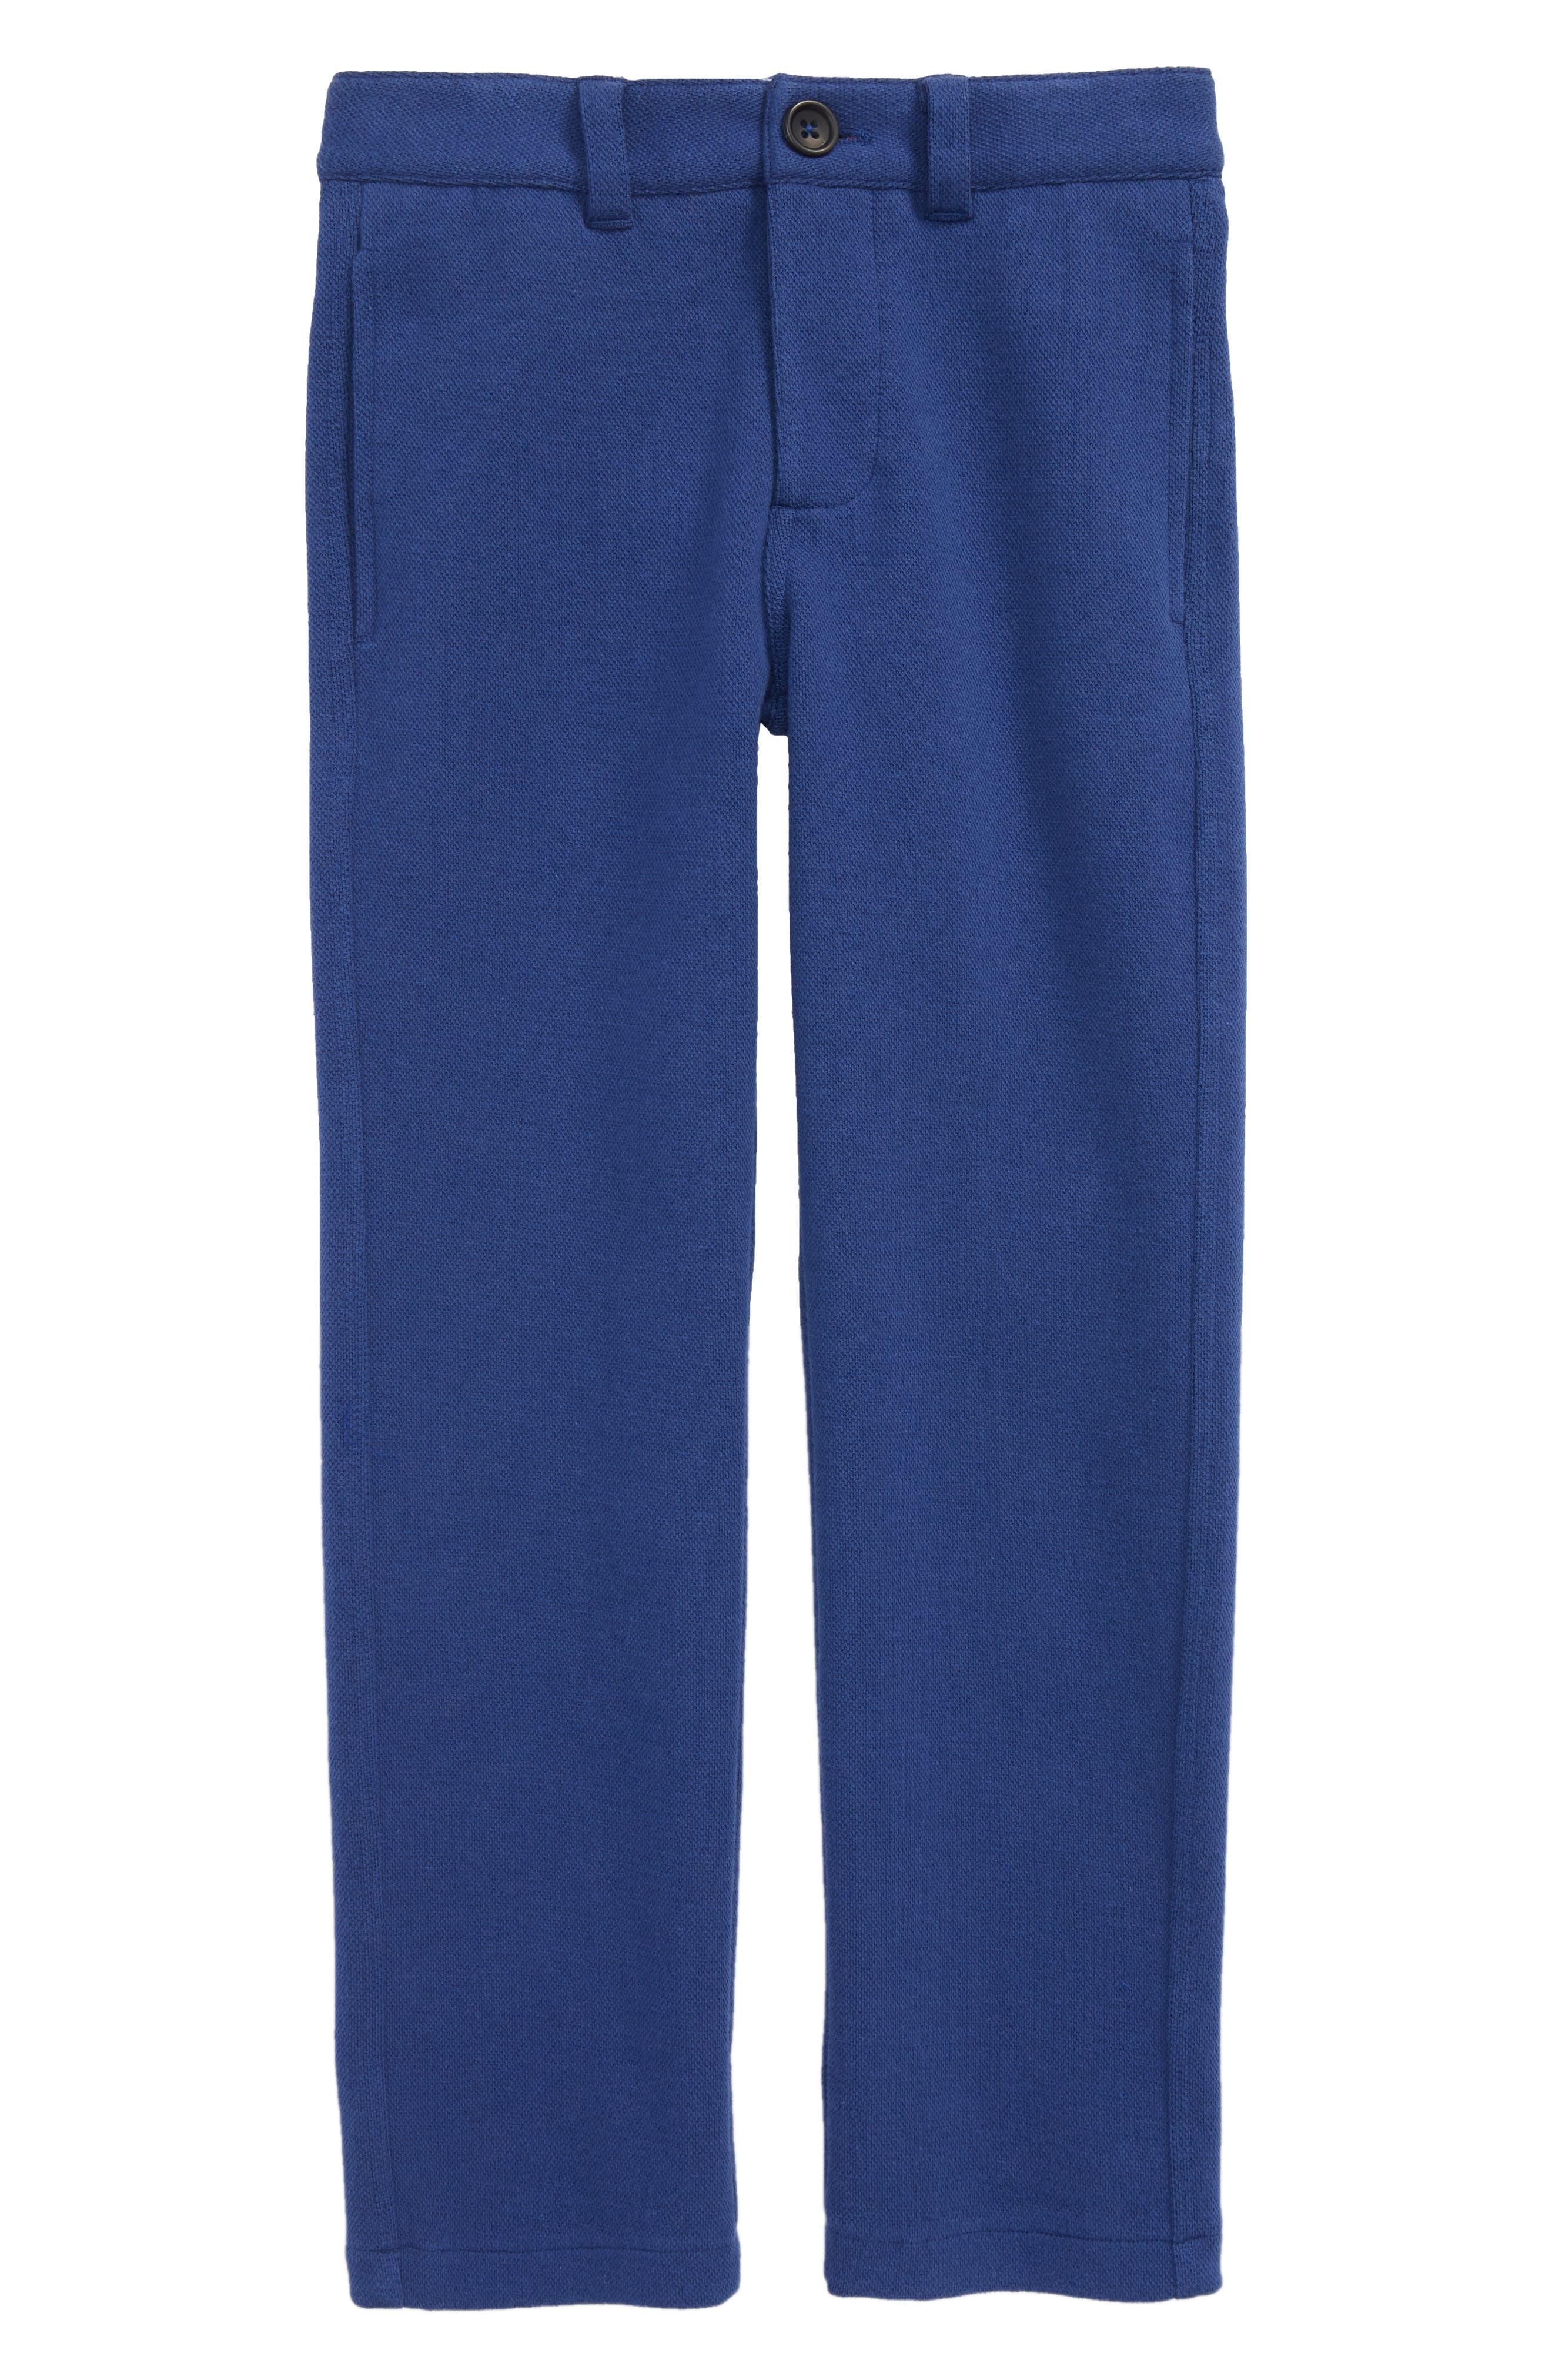 Jersey Chino Pants,                         Main,                         color, Beacon Blue